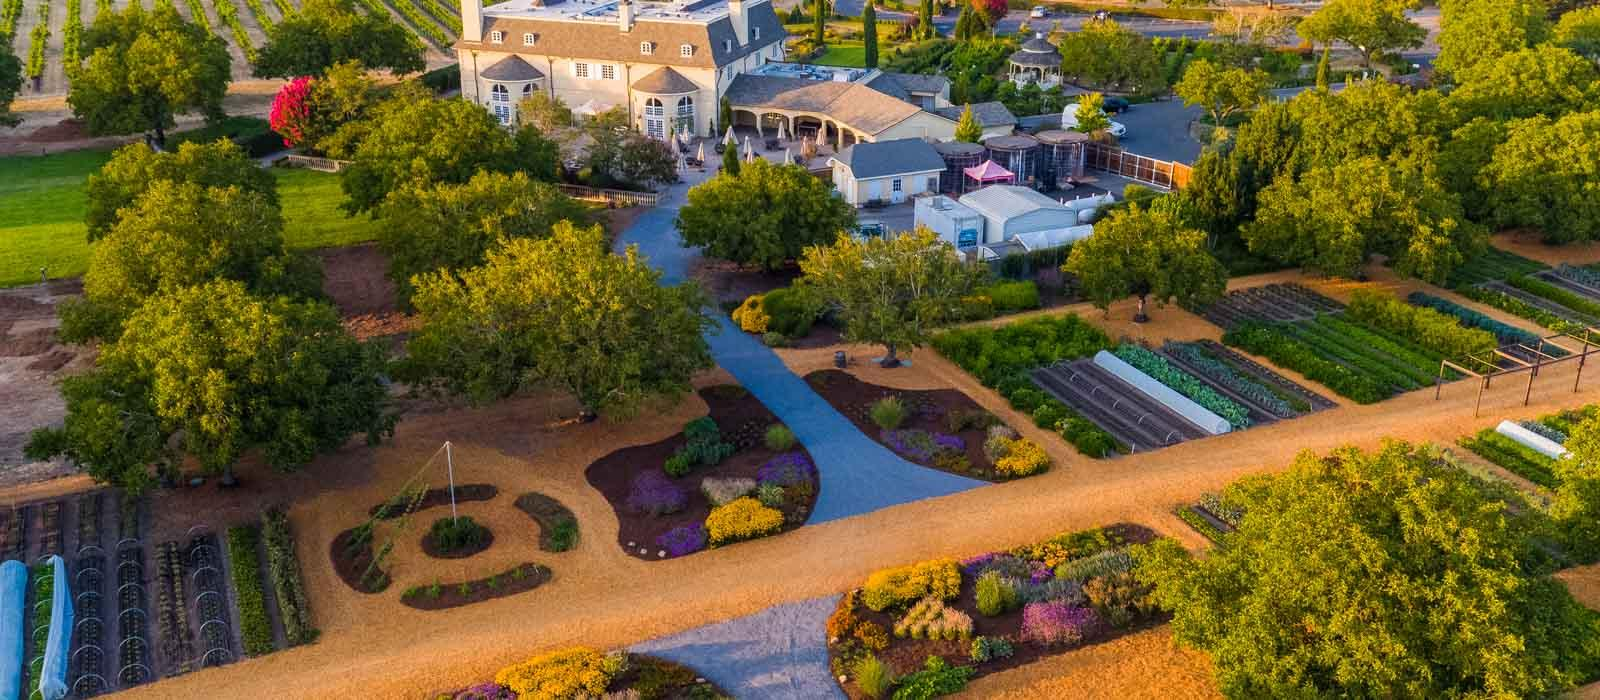 Kendall Jackson Winery Gardens